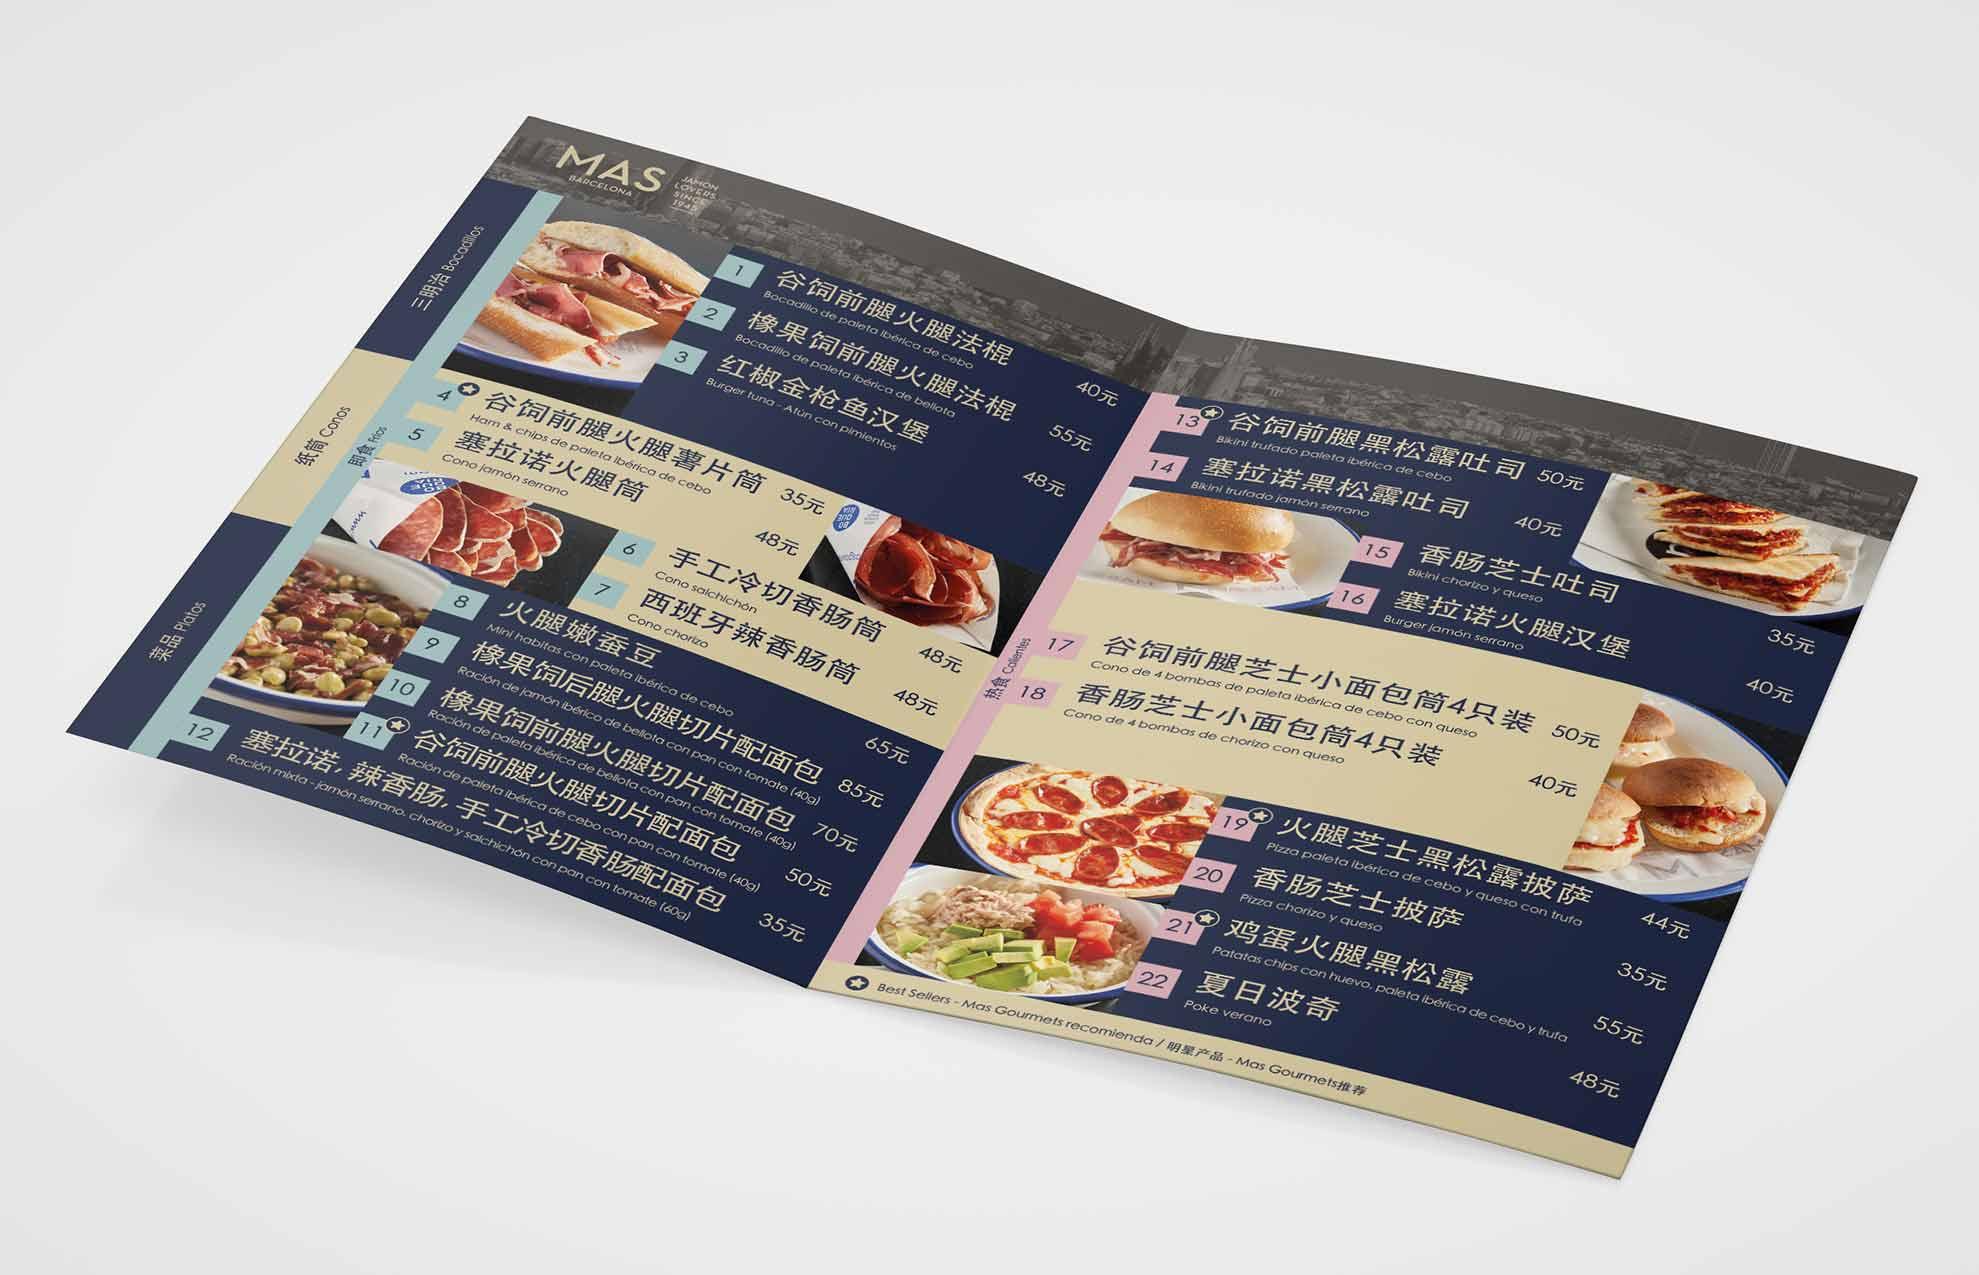 disseny de carta de restaurant per china 1 - Estrategia en branding y comunicación comercial para exportar a China